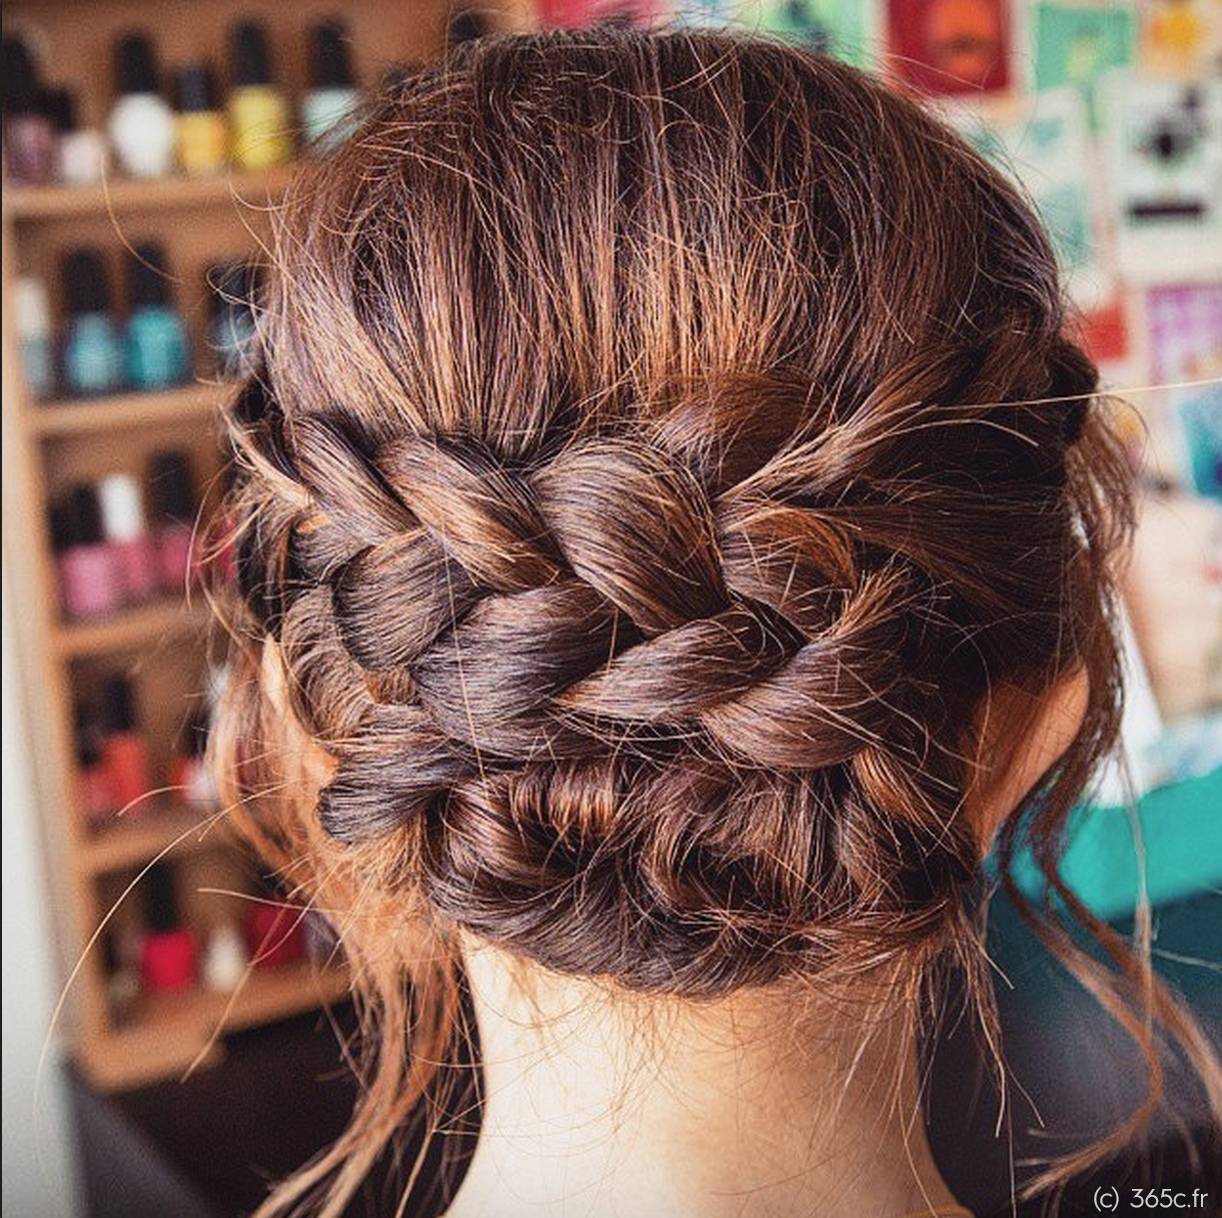 Hairstyle updo wedding hairstyle braid brown hair c